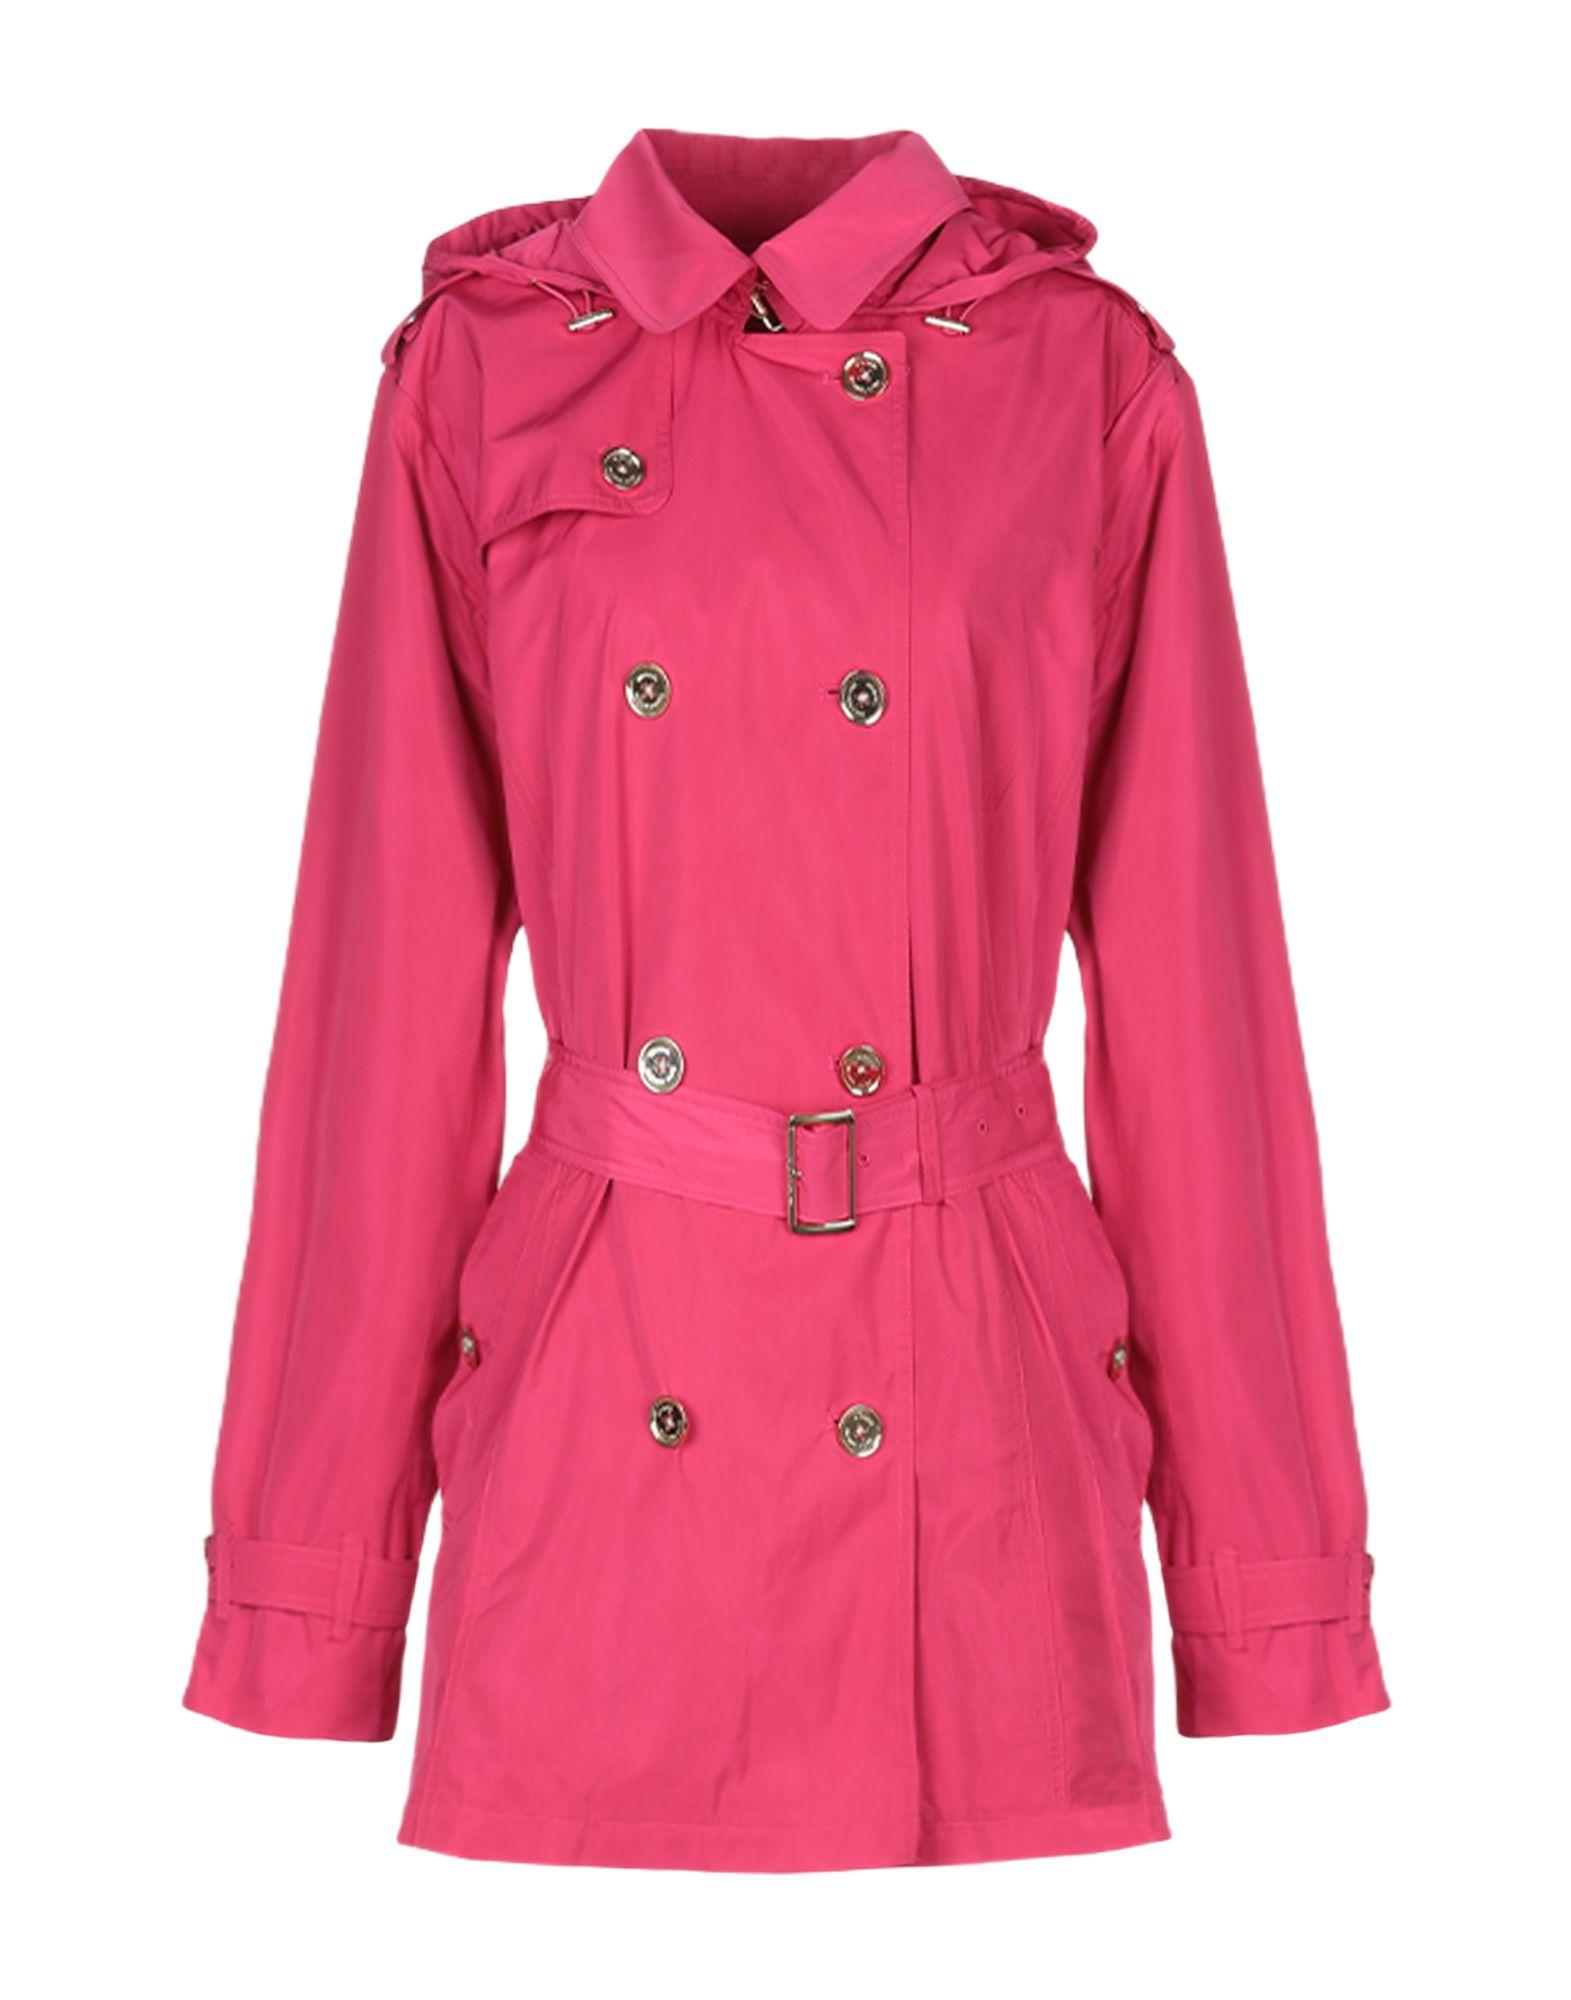 MICHAEL MICHAEL KORS Full-length jacket - Coats & Jackets | YOOX.COM